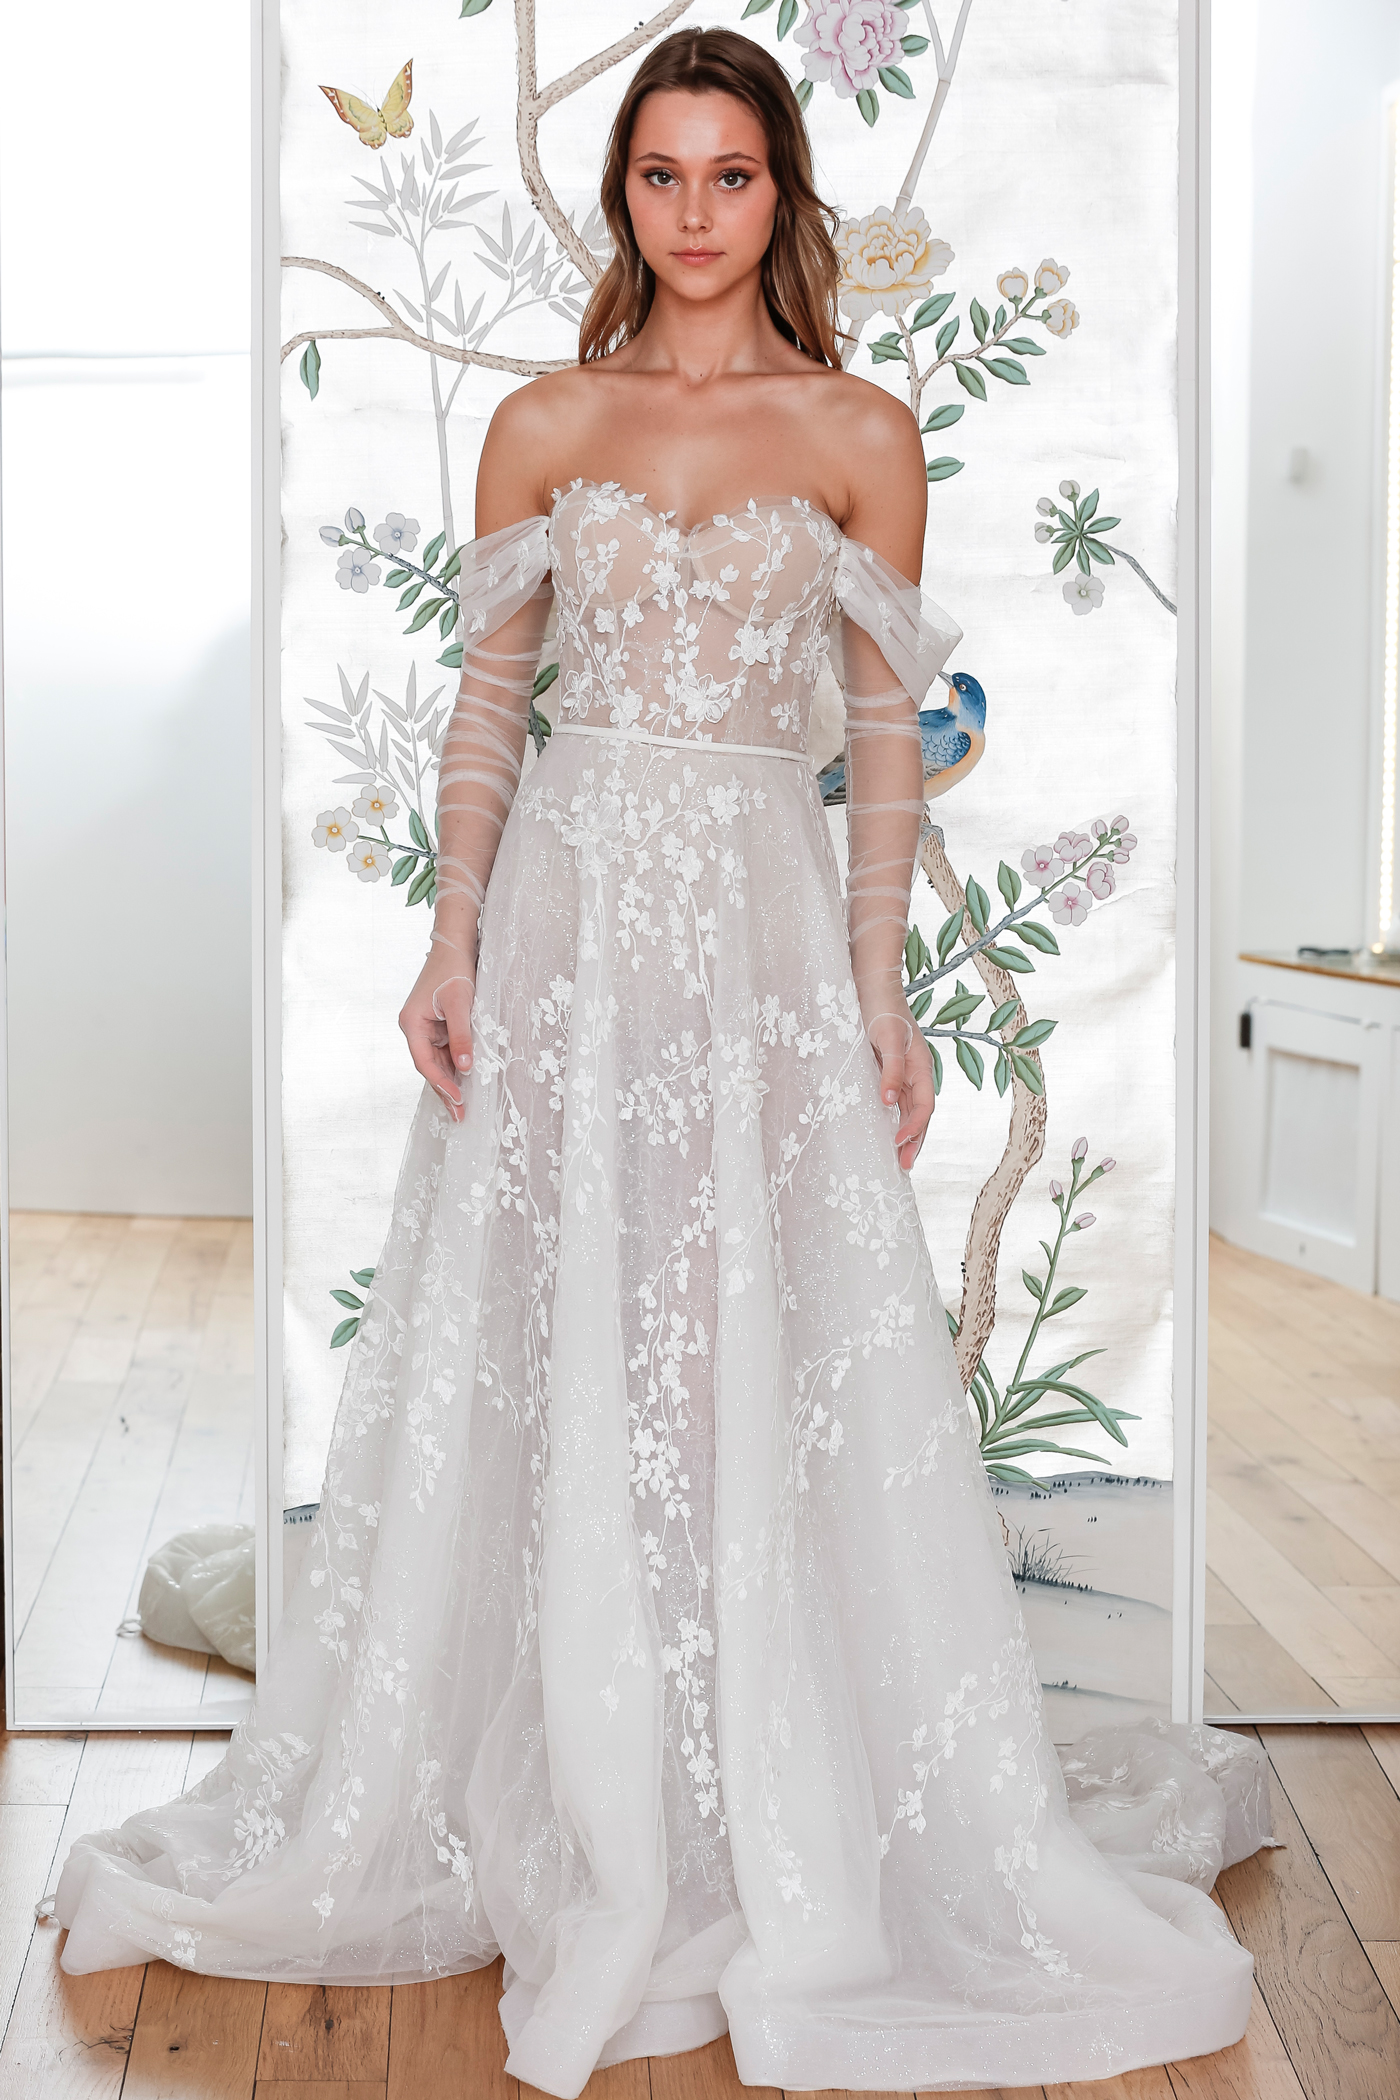 lee petra grebenau belted off the shoulder a line wedding dress with sheer arm length gloves spring 2020